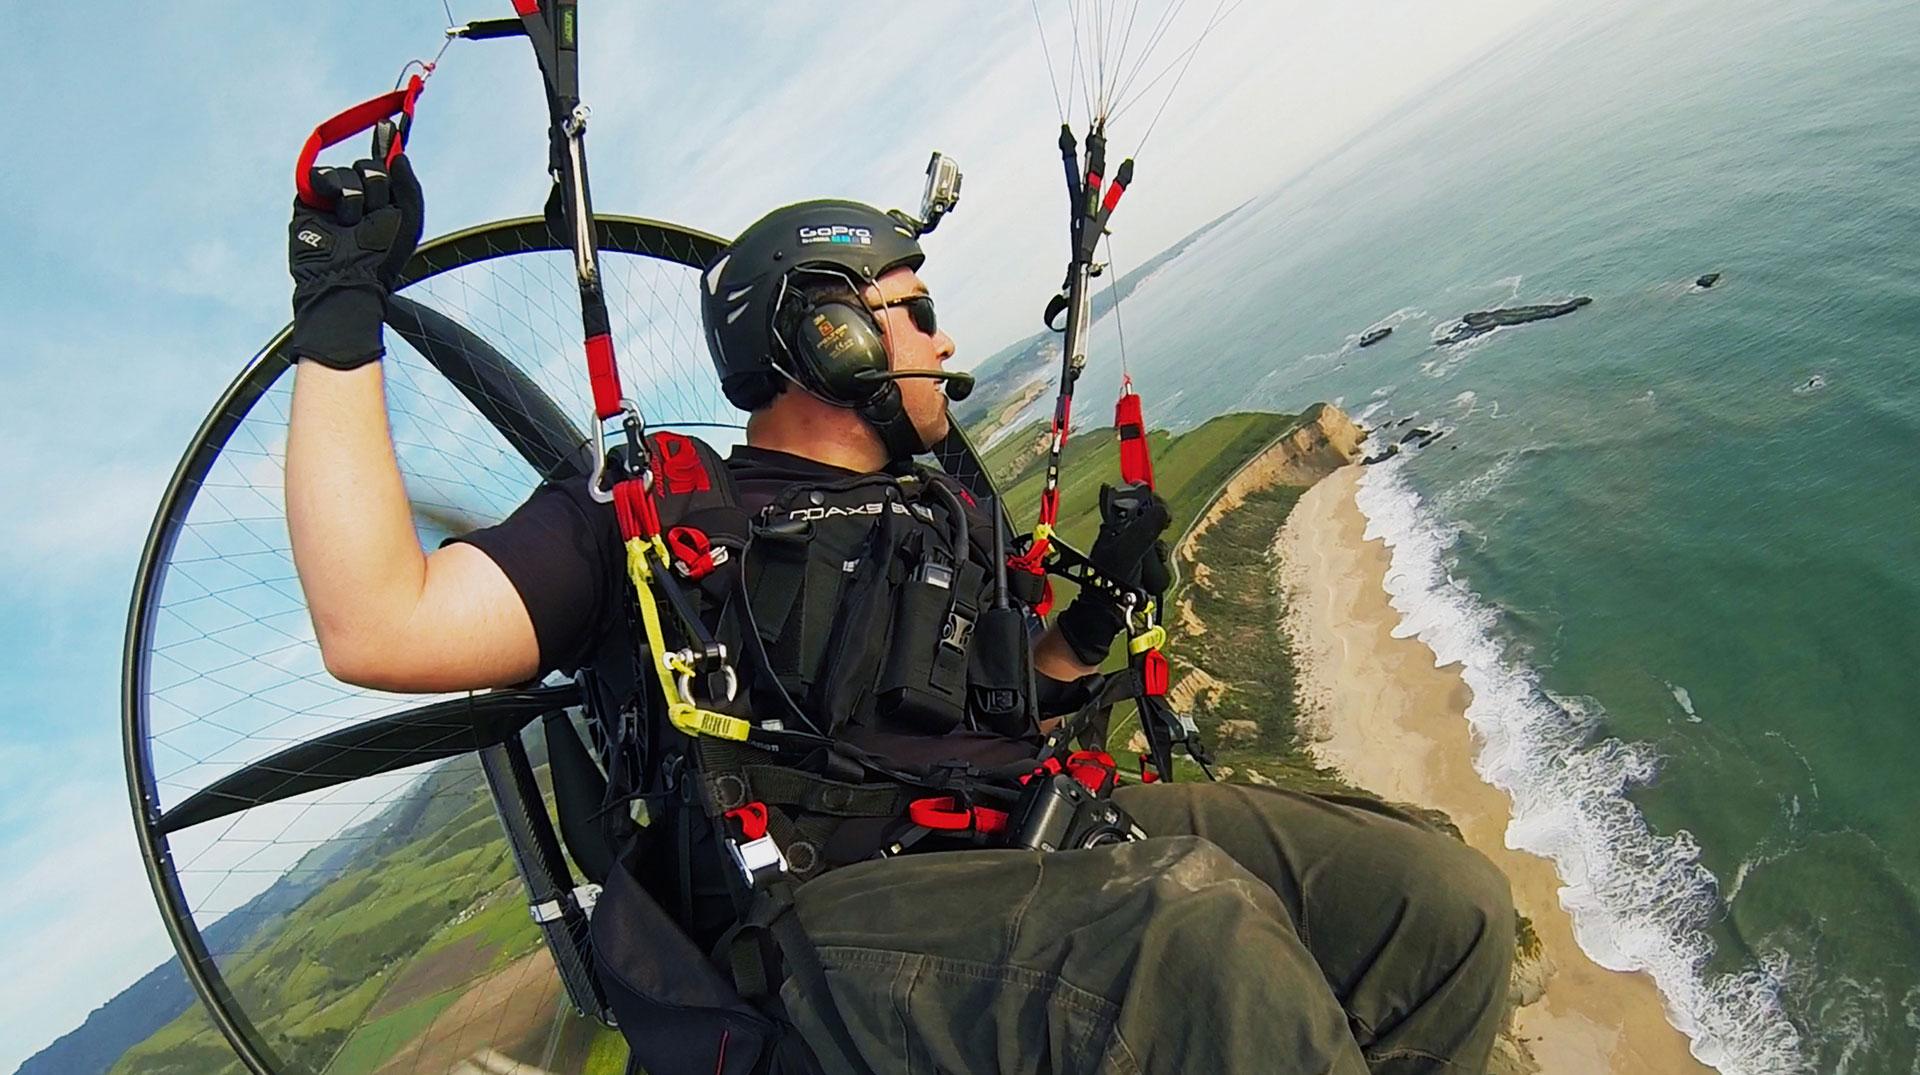 Scout-carbon-paramotor-flight-above-sea-sunny-beach-blue-sky-california_1920-web